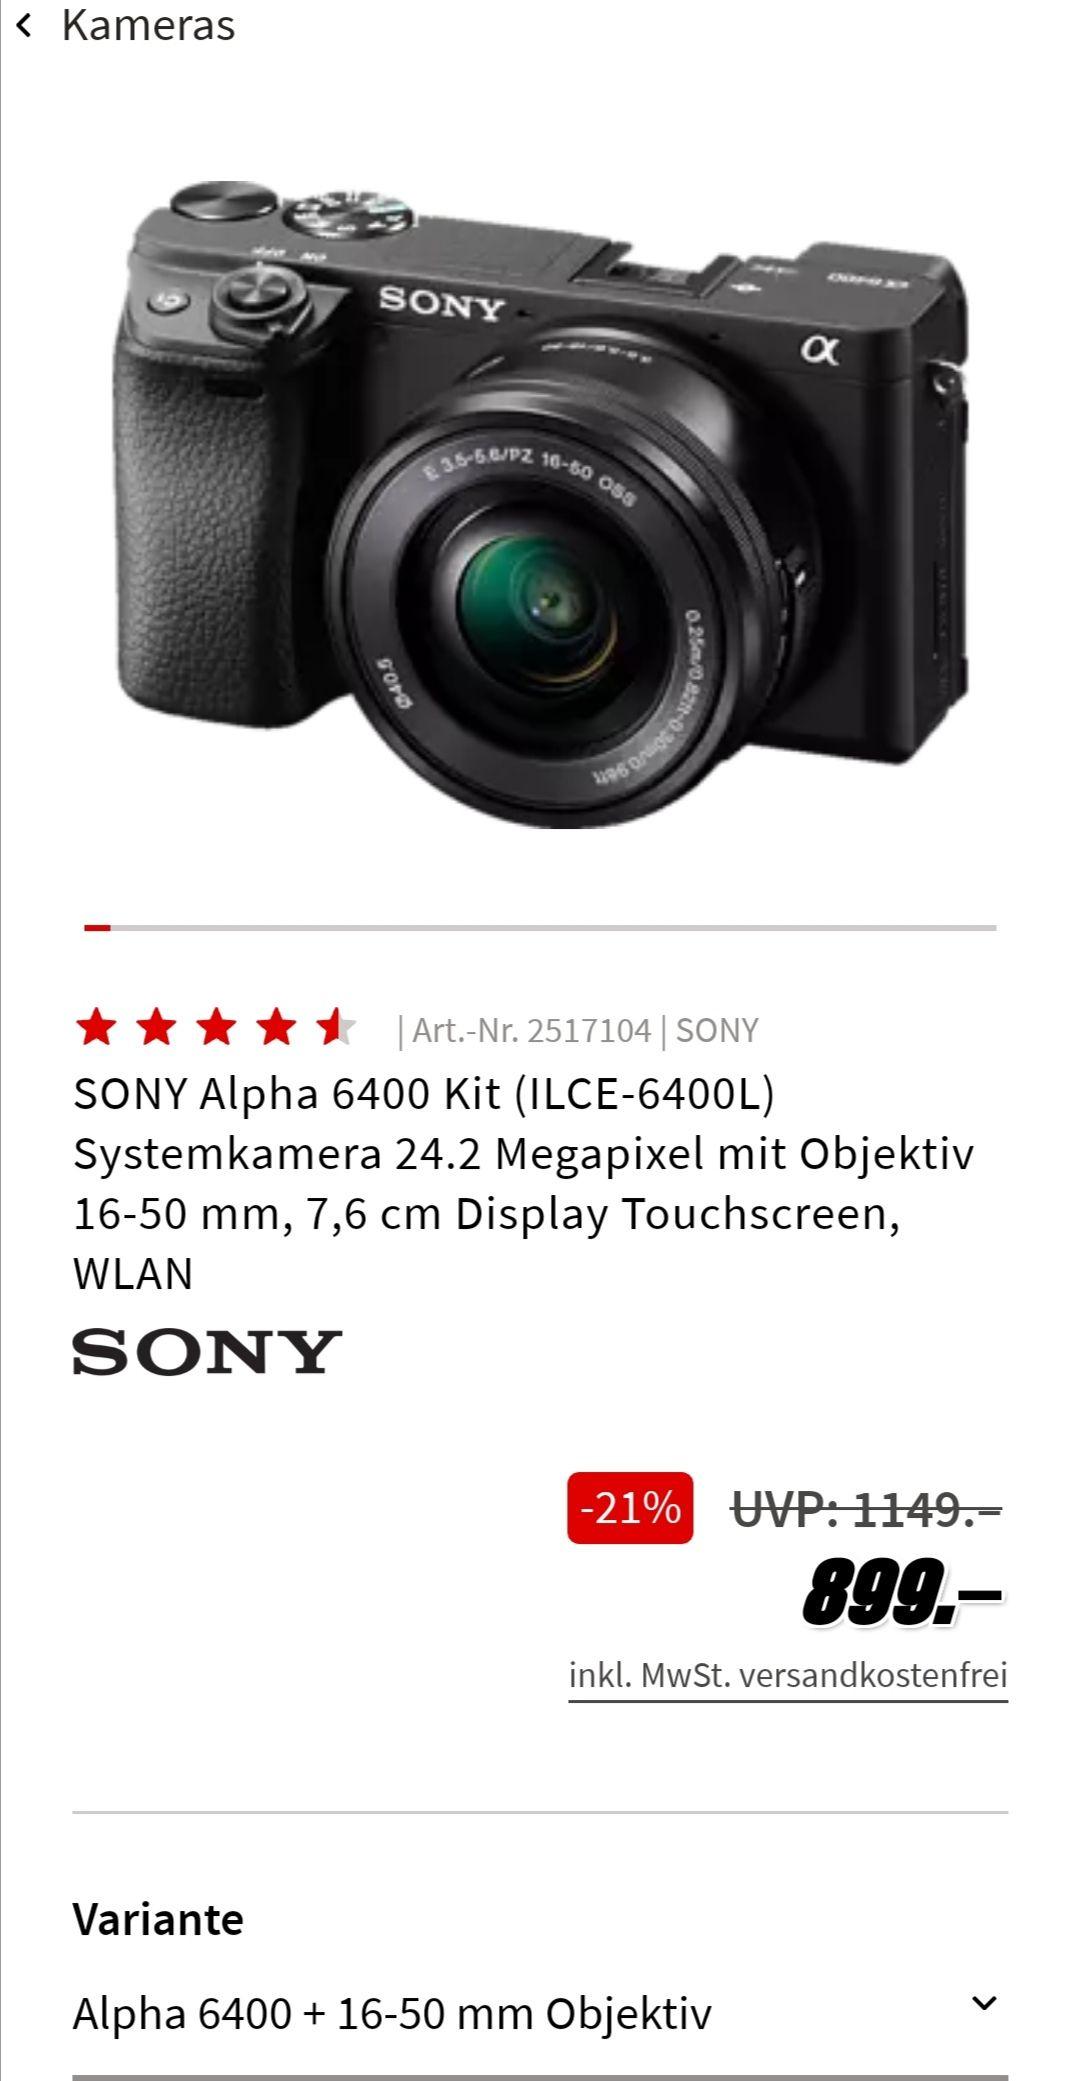 Sony Alpha 6400 (ILCE-6400 KIT mit 16-50mm)